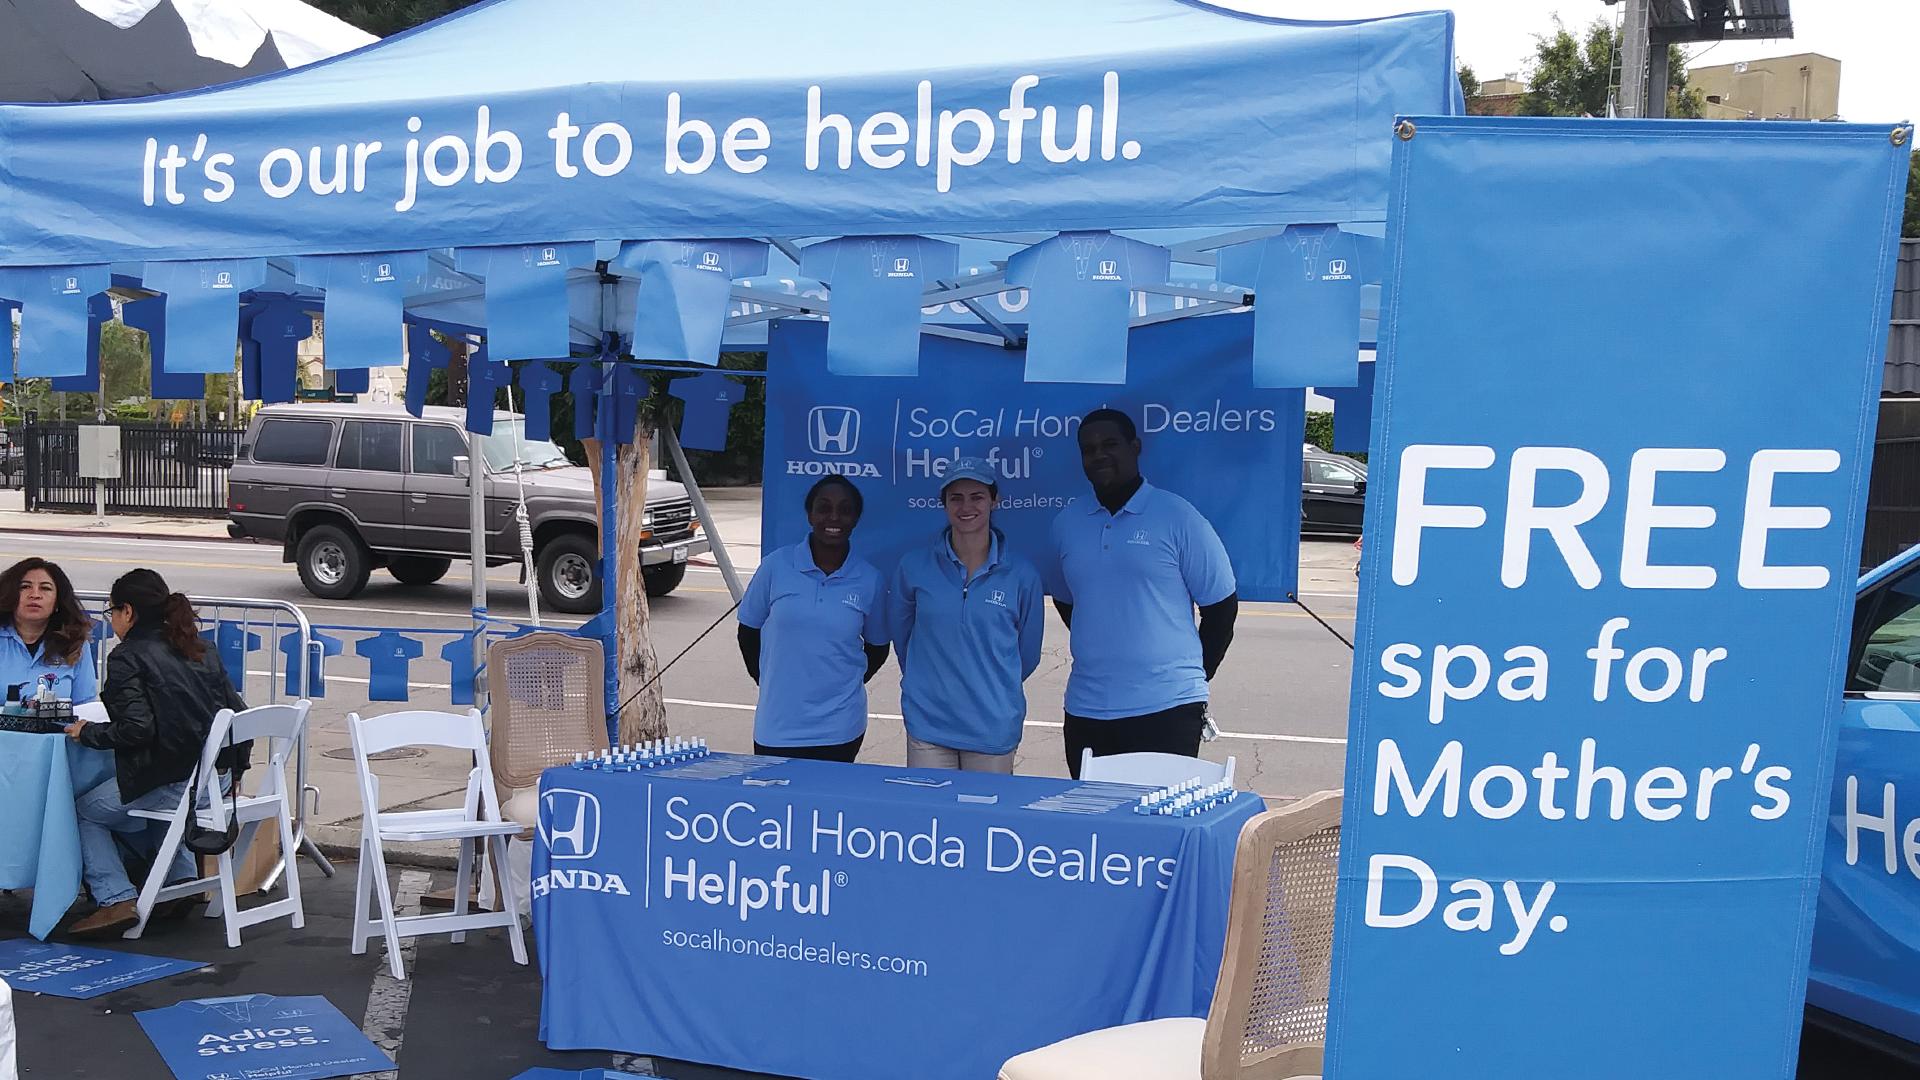 Southern California Honda Dealers Association Association Blog and